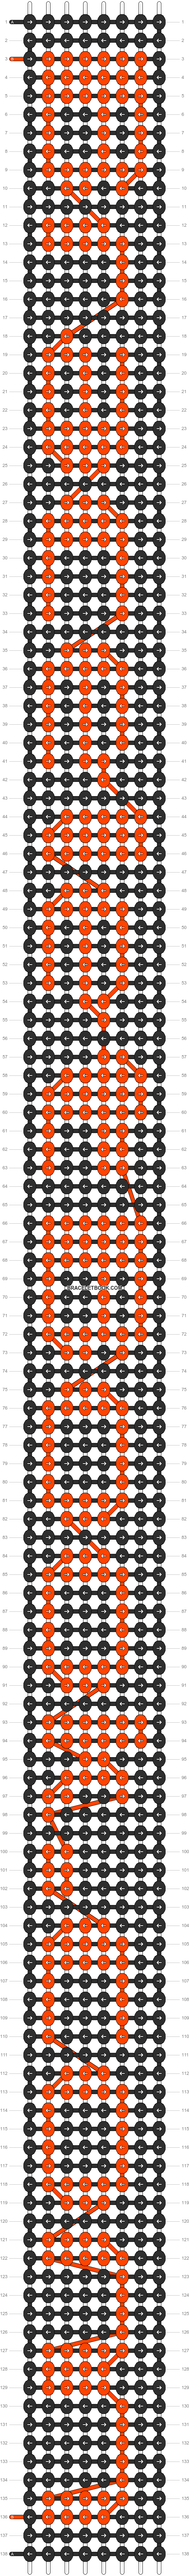 Alpha pattern #510 pattern